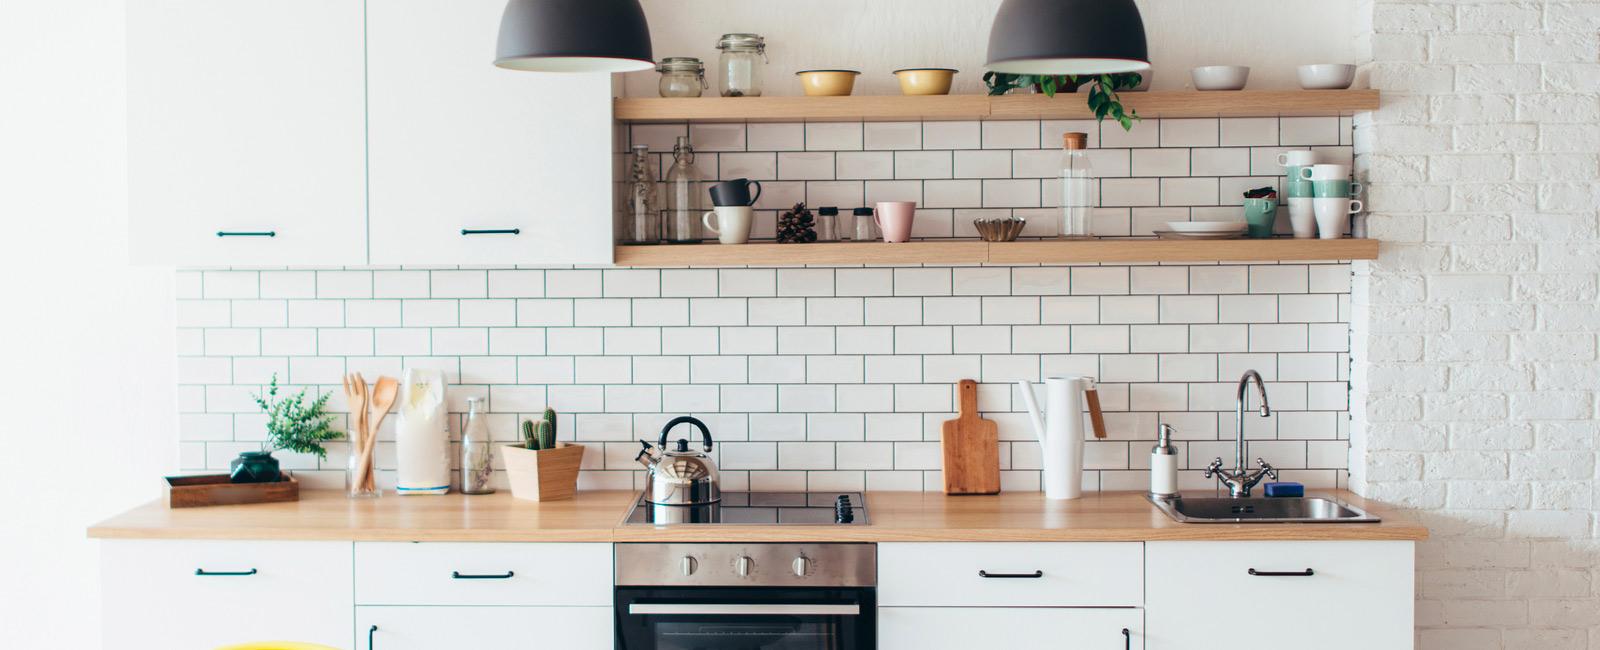 installer un meuble de cuisine